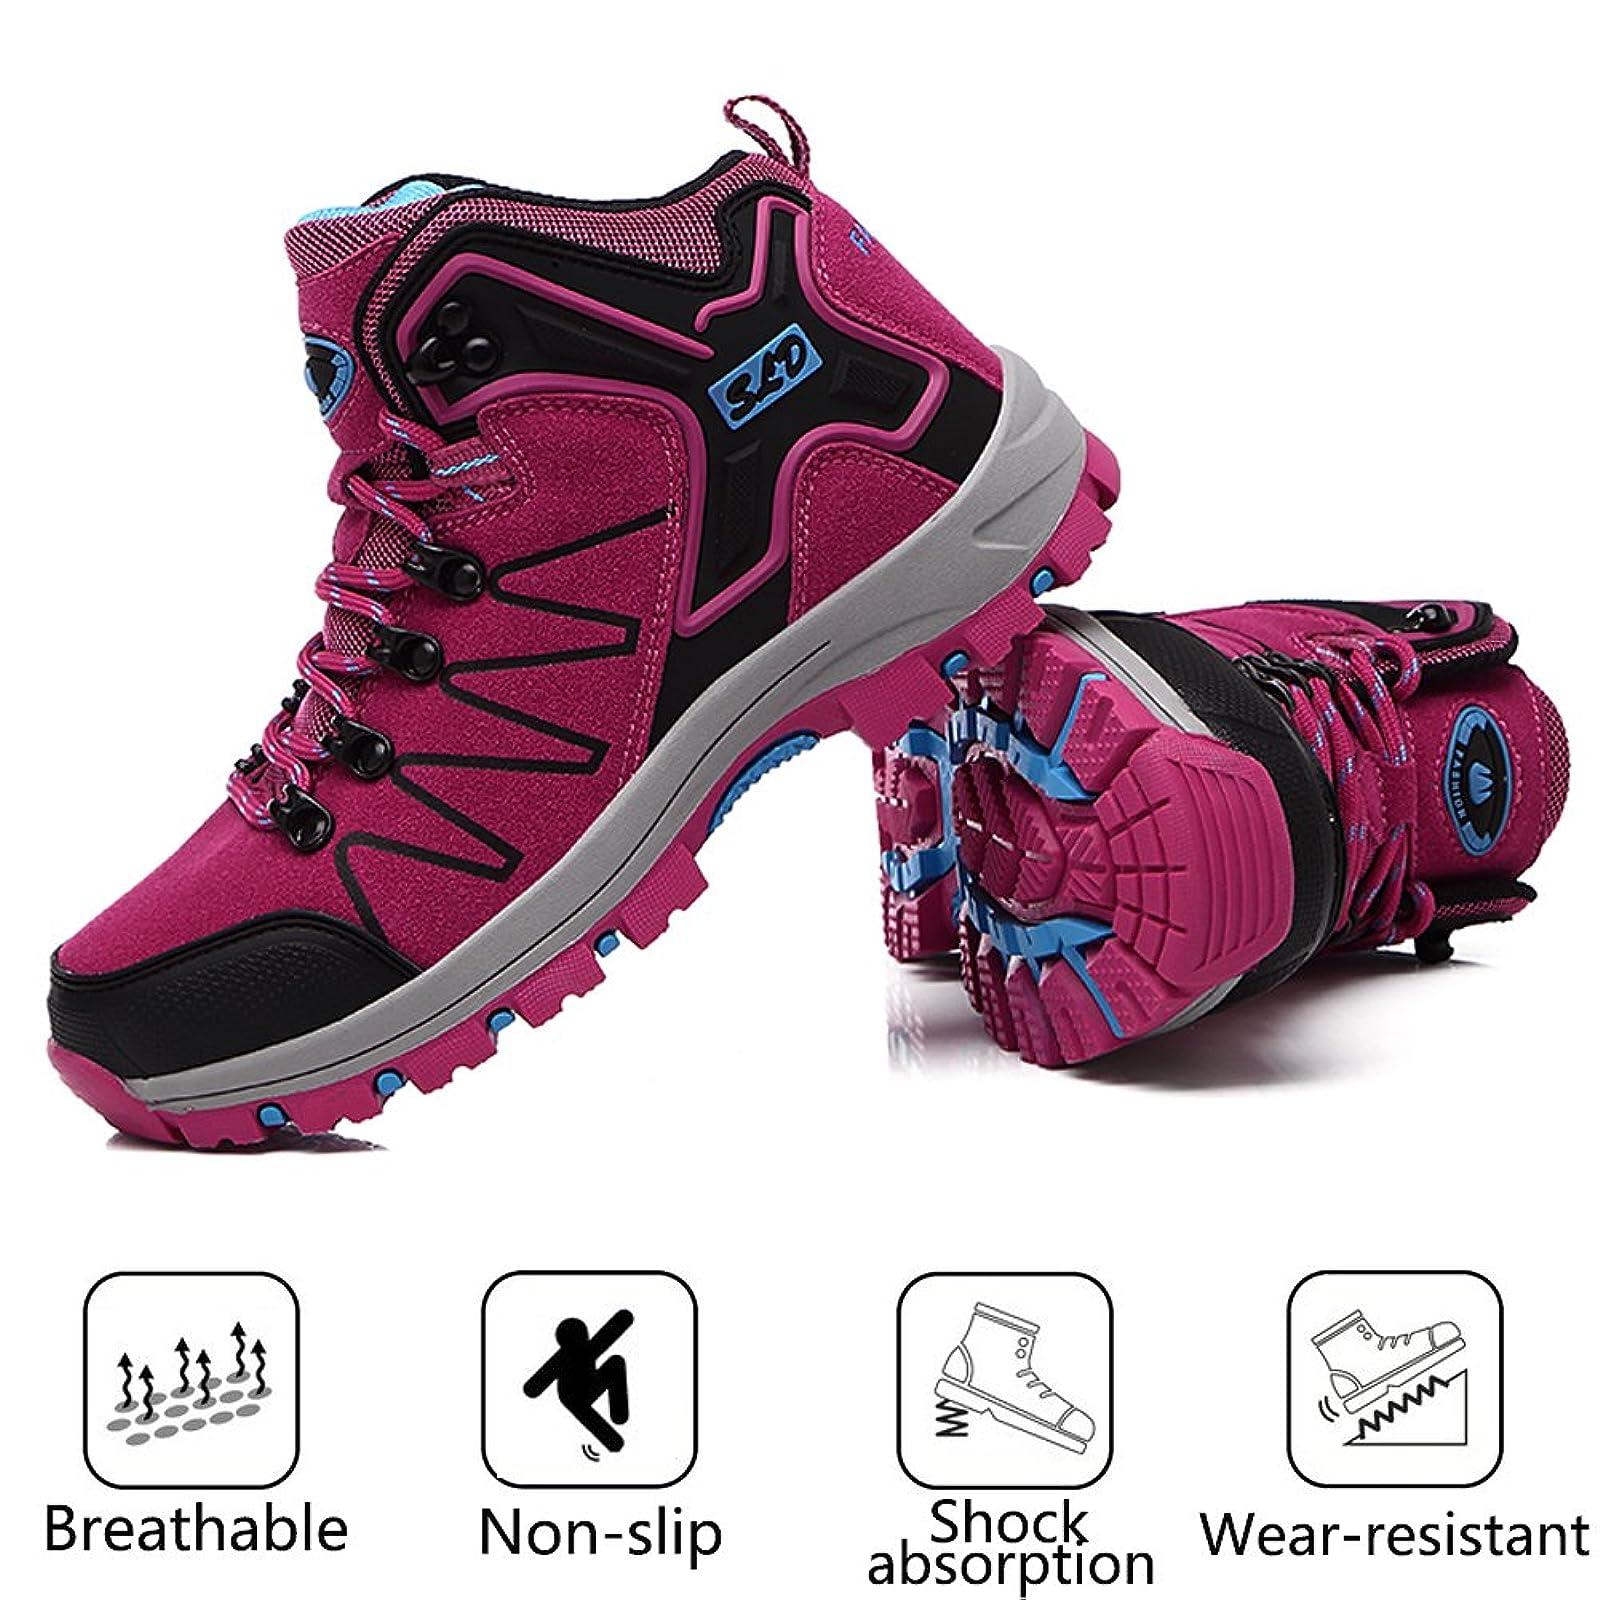 FEOZYZ Womens Hiking Boots Trekking Shoes Anti- QLMXZY's 1008 - 4